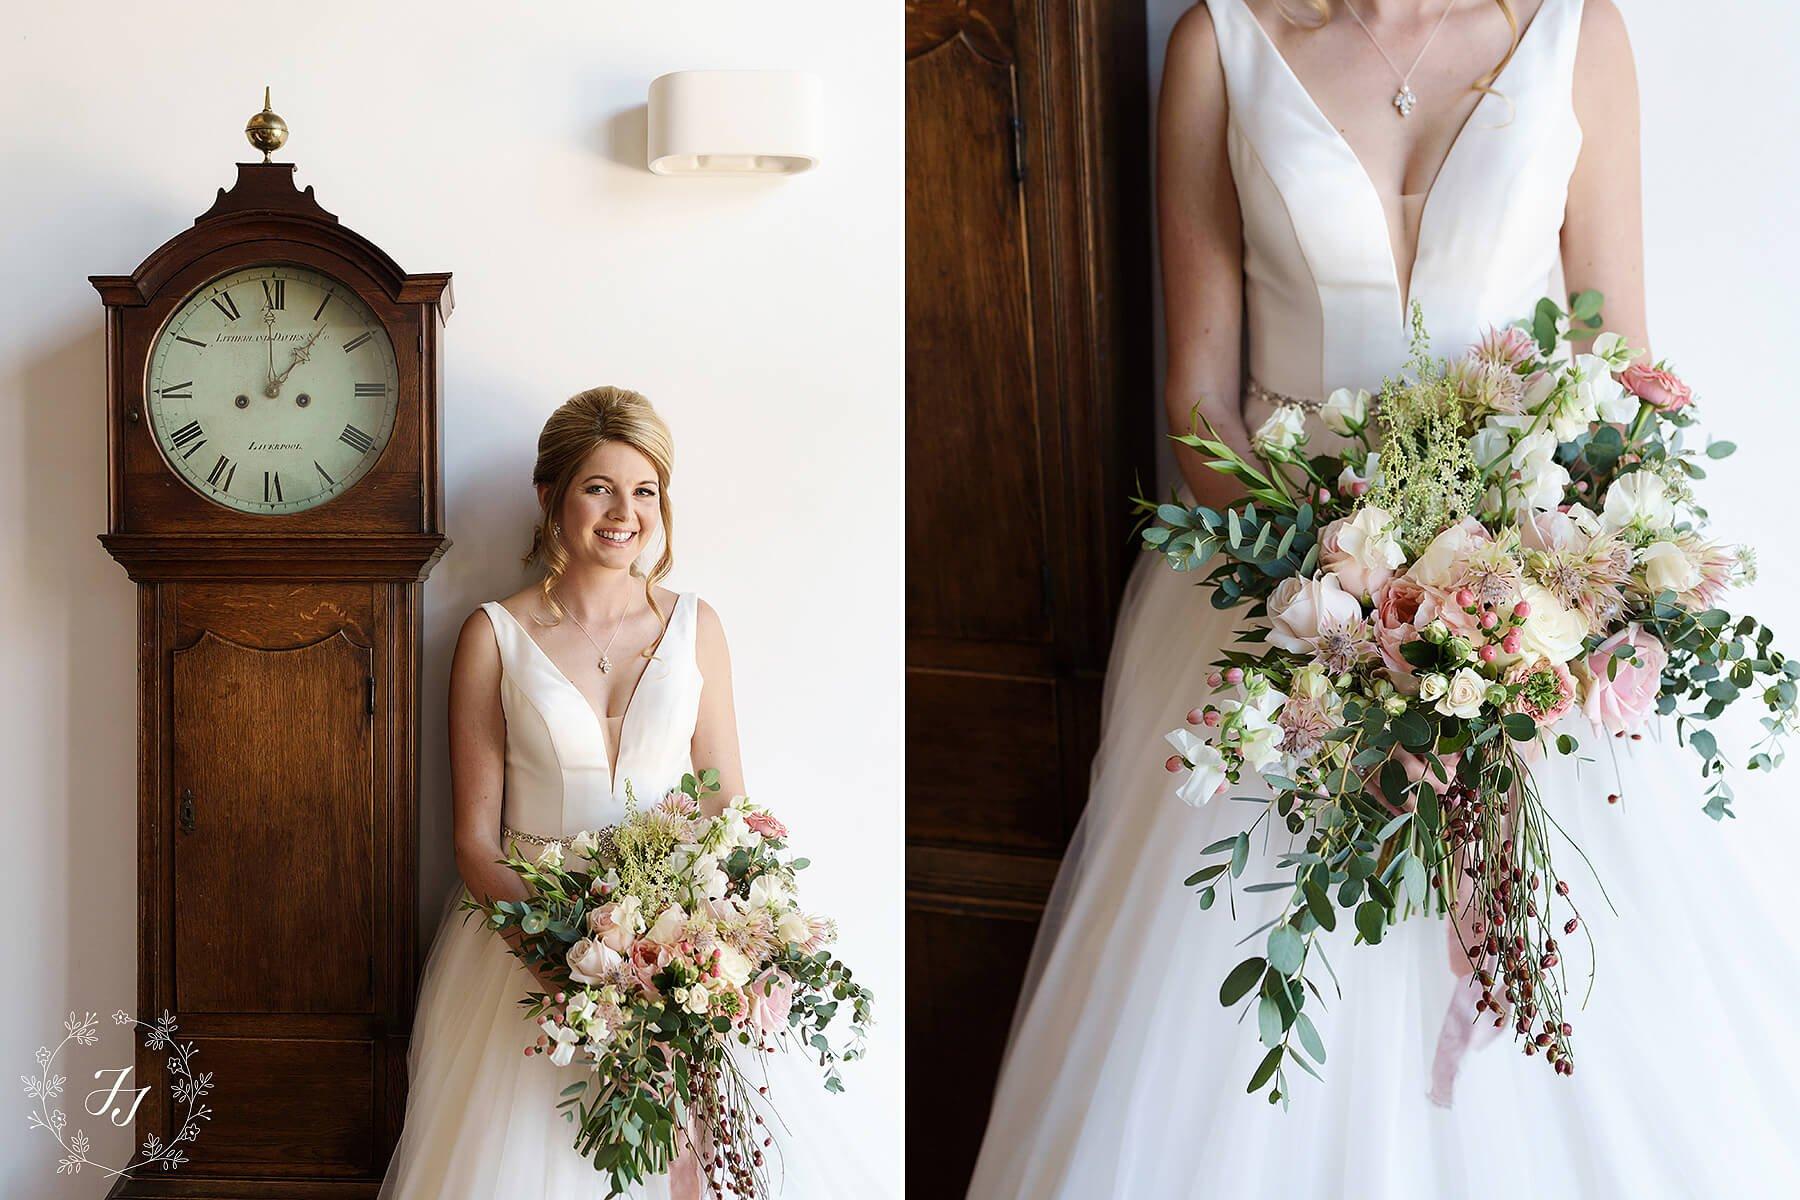 bride wearing stellayork wedding dress holding rustic wedding bouquet